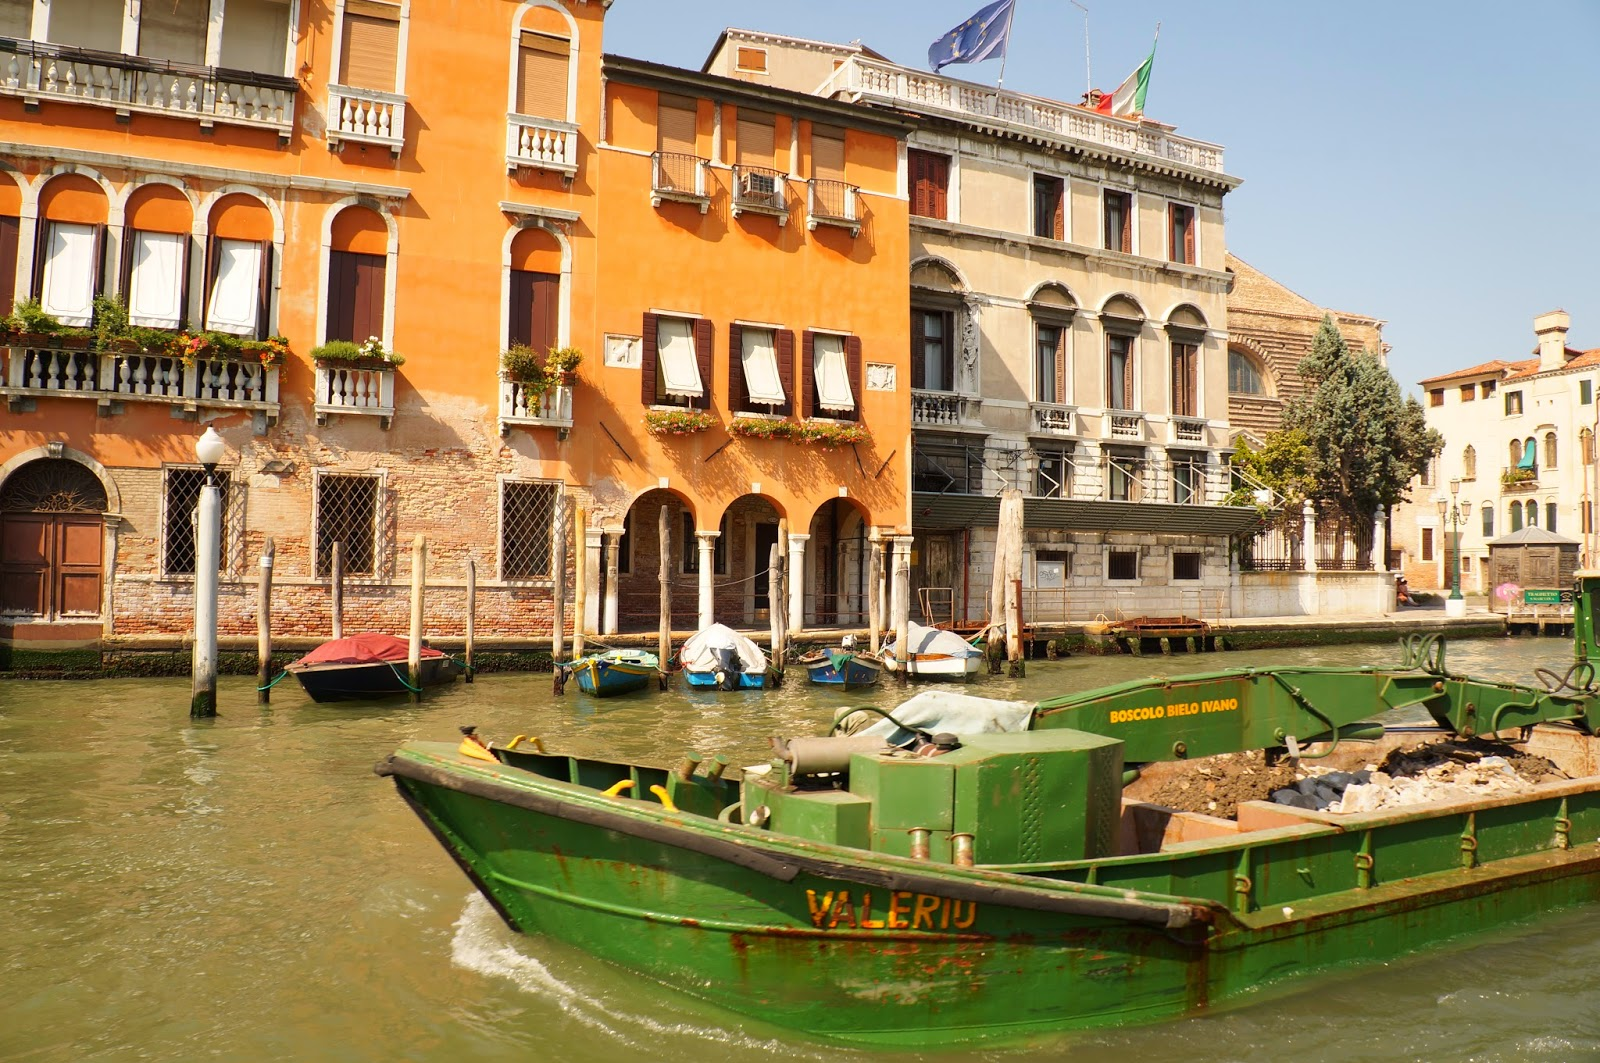 Мусор в Венеции